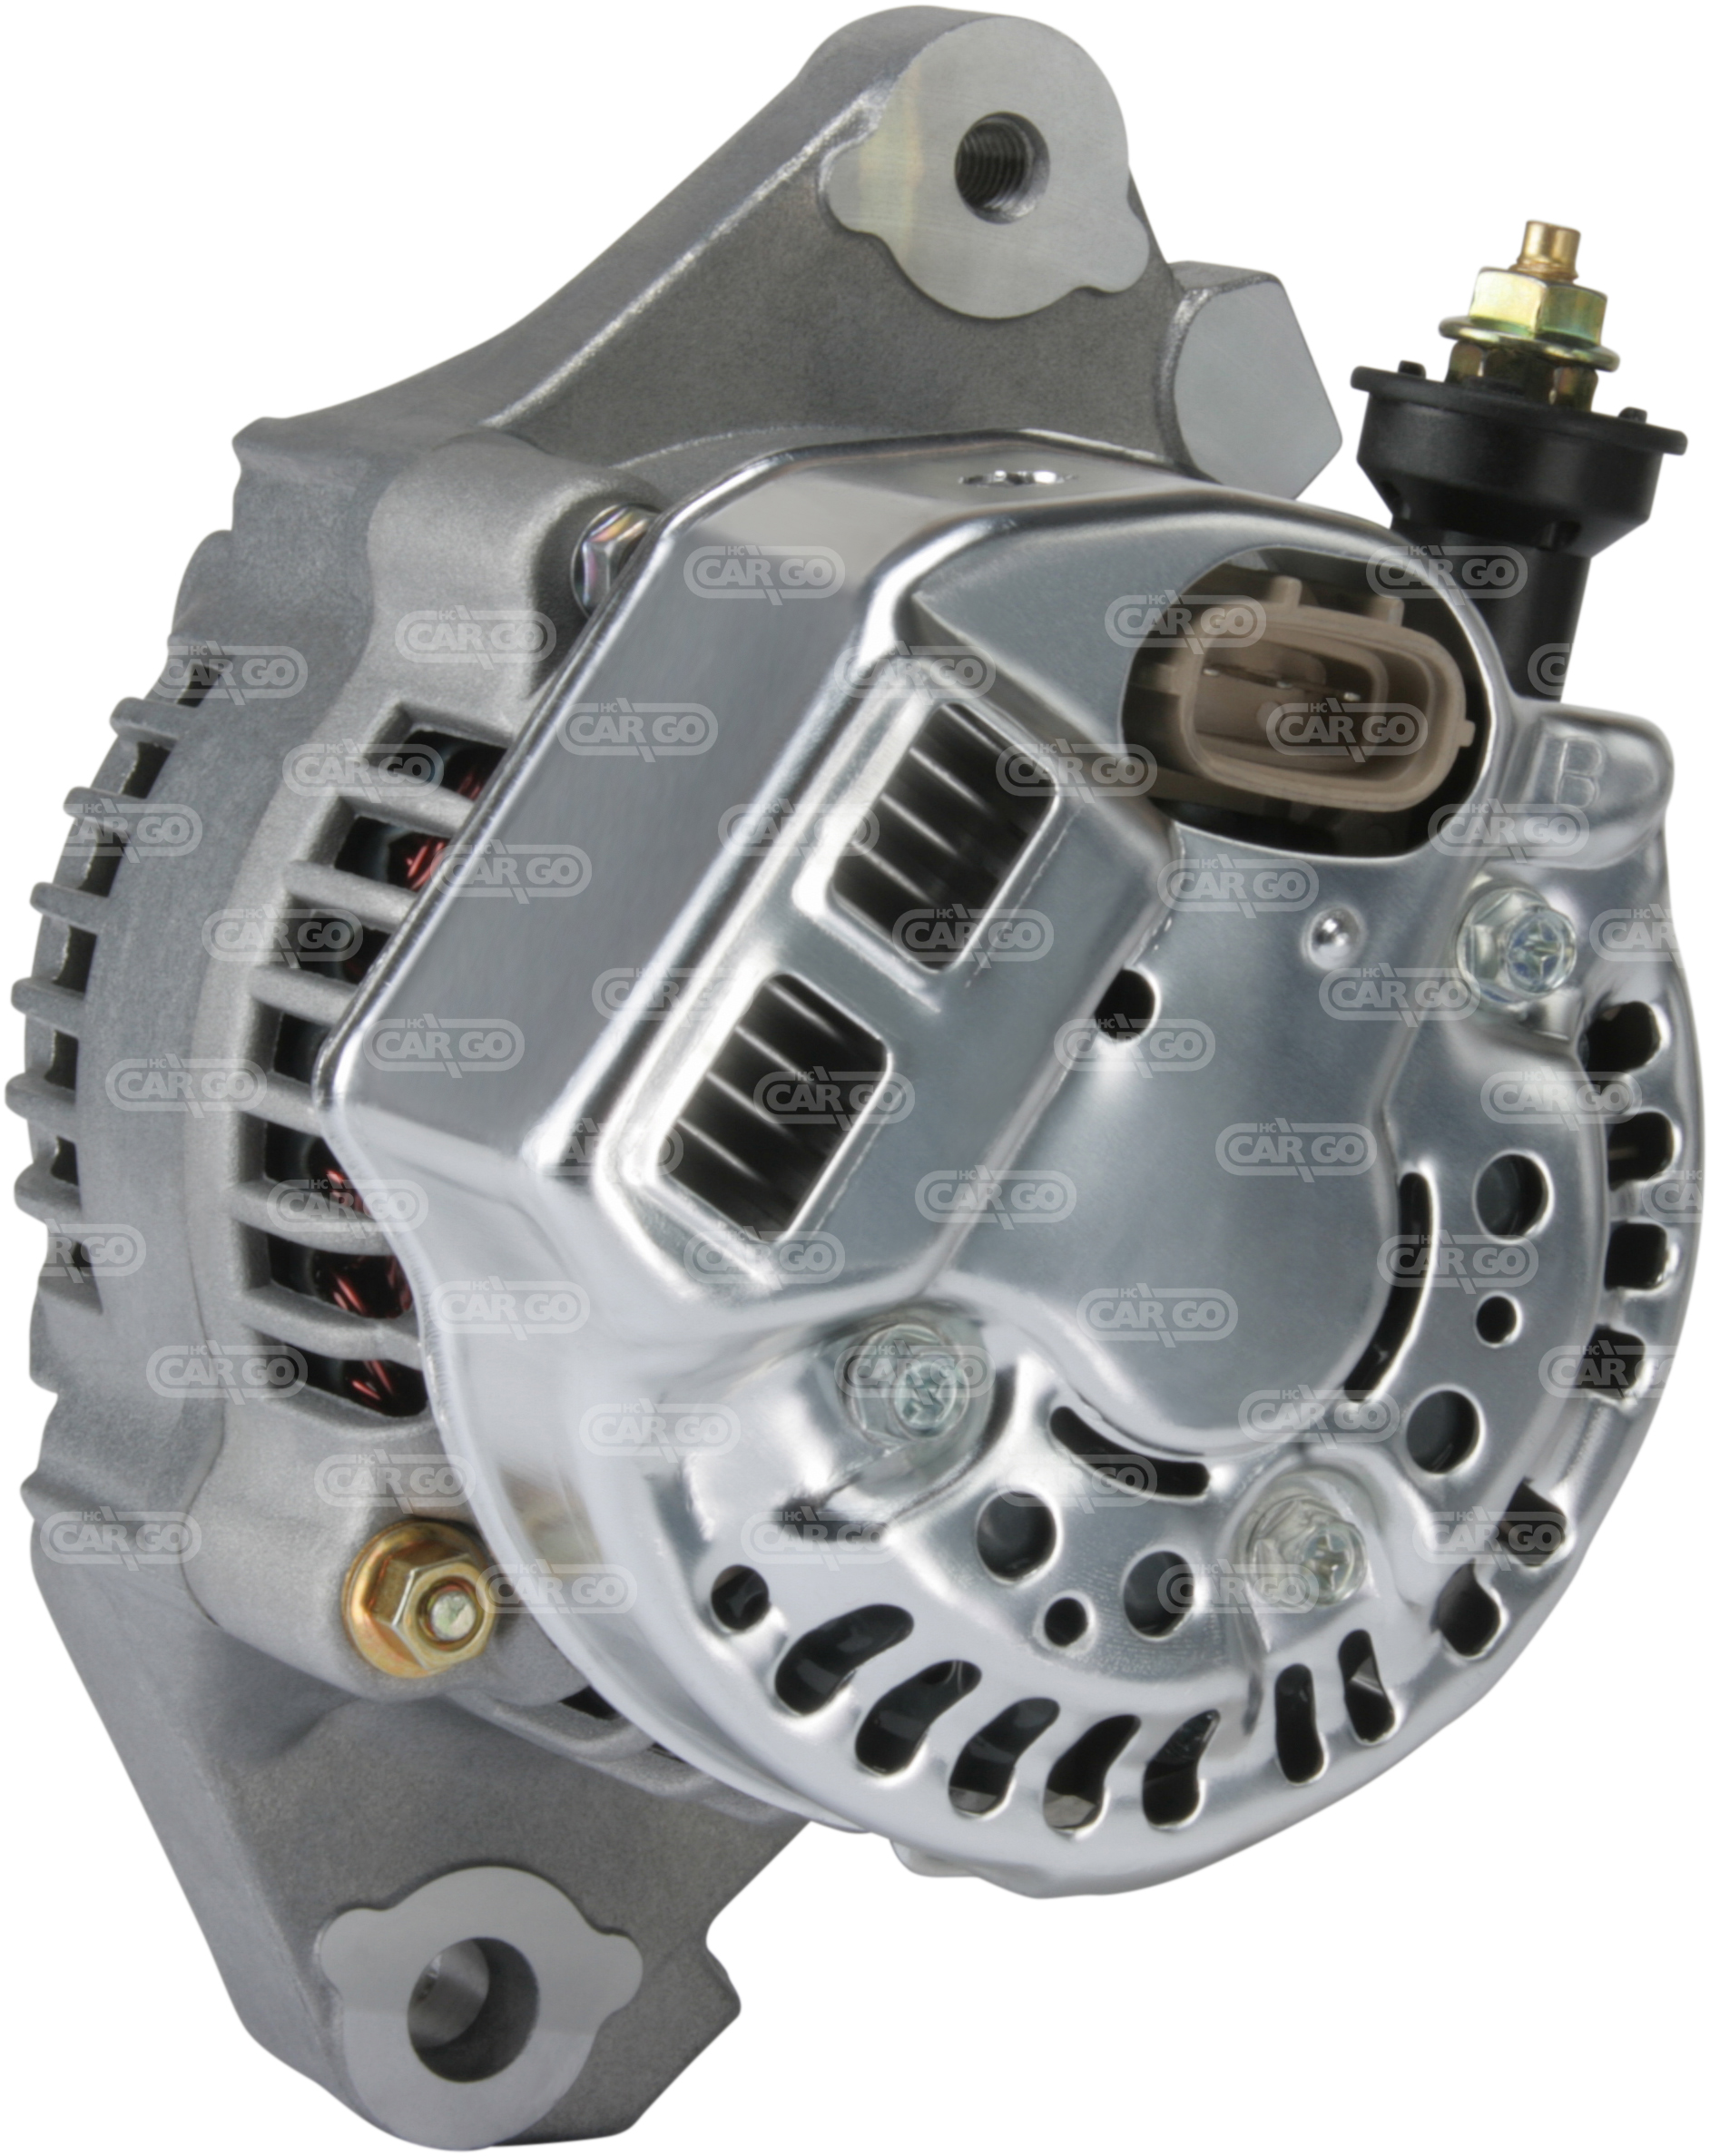 Alternateur 321 Voltage14 Amp60